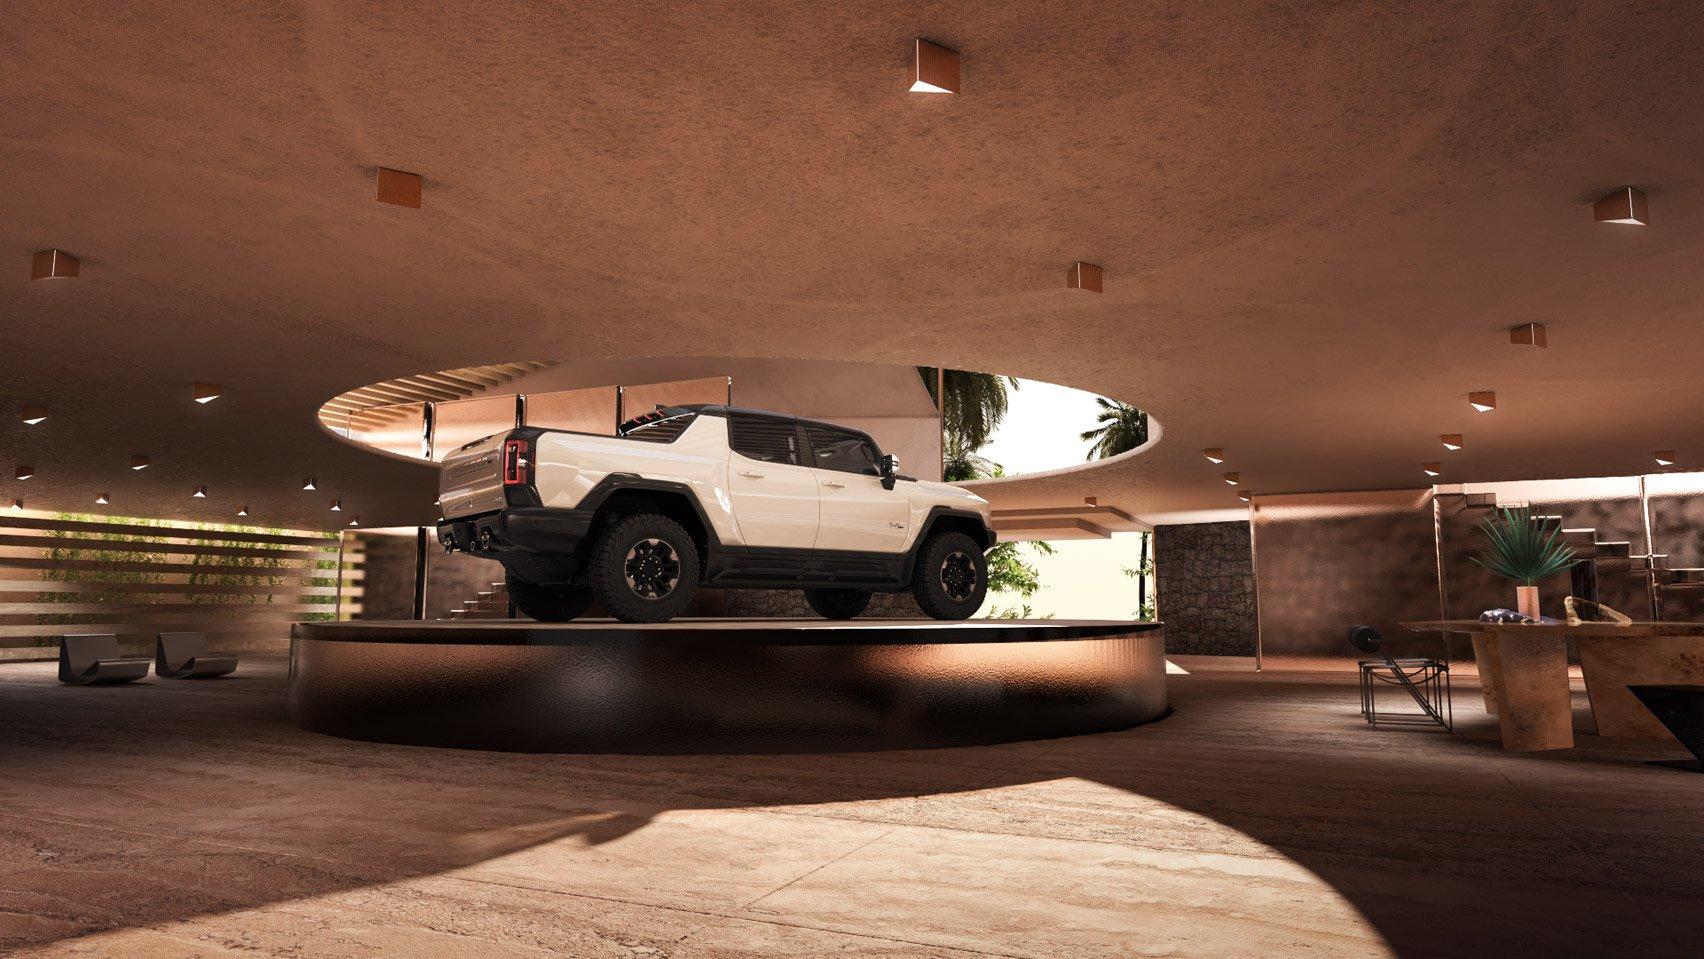 Kelly Wearstler Desert Garage concept hummer ev lebron james